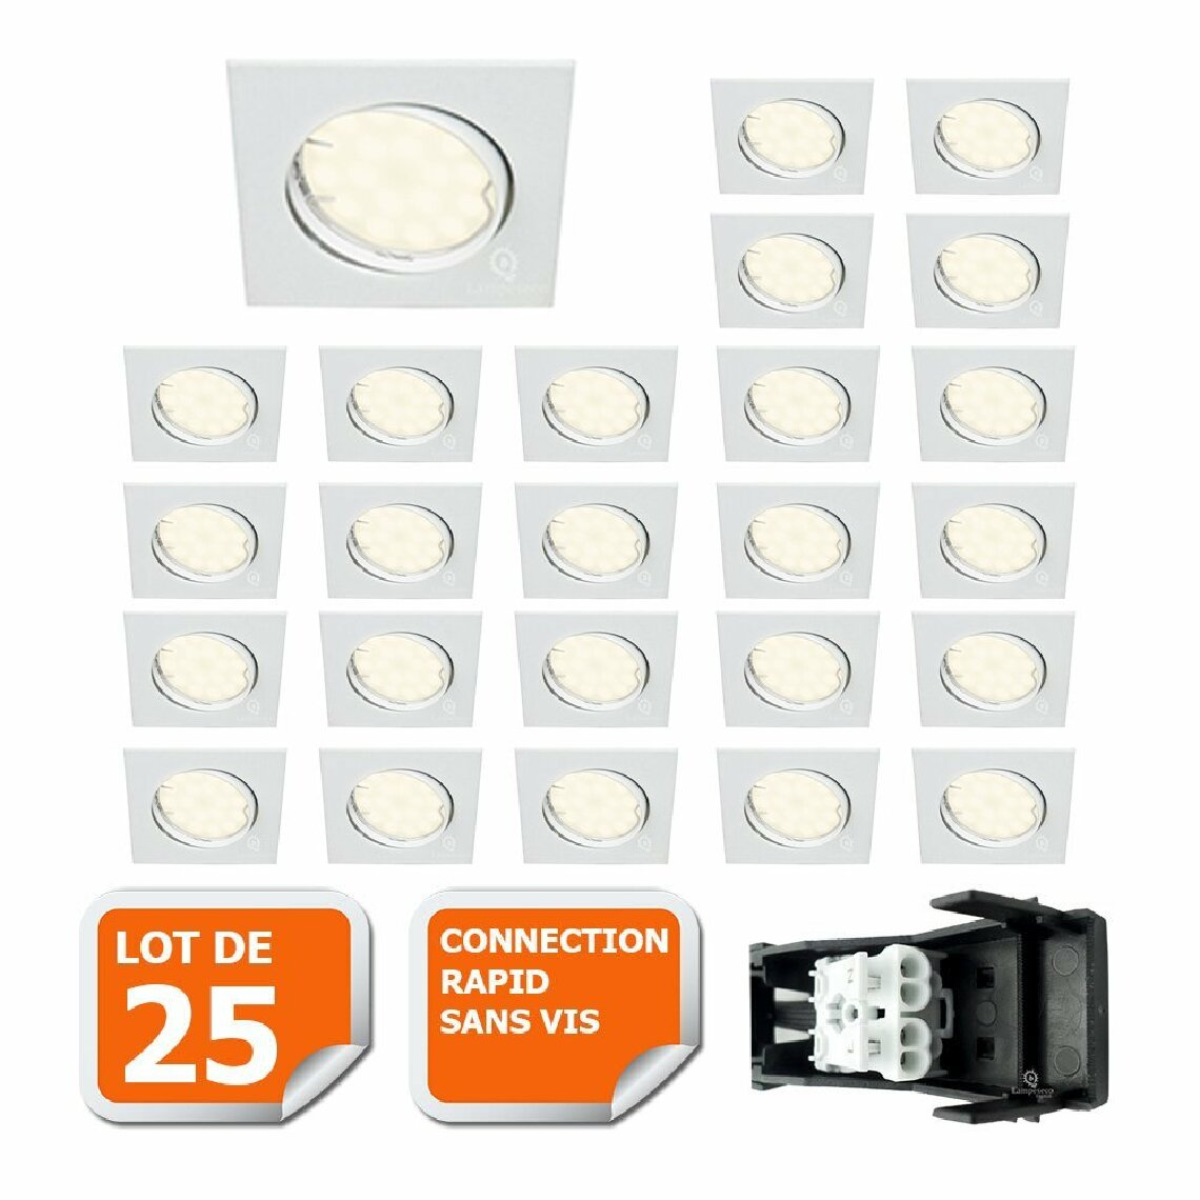 Lampesecoenergie LOT DE 25 SPOT ENCASTRABLE ORIENTABLE CARRE LED SMD GU10 230V BLANC RENDU ENVIRON 50W HALOGENE